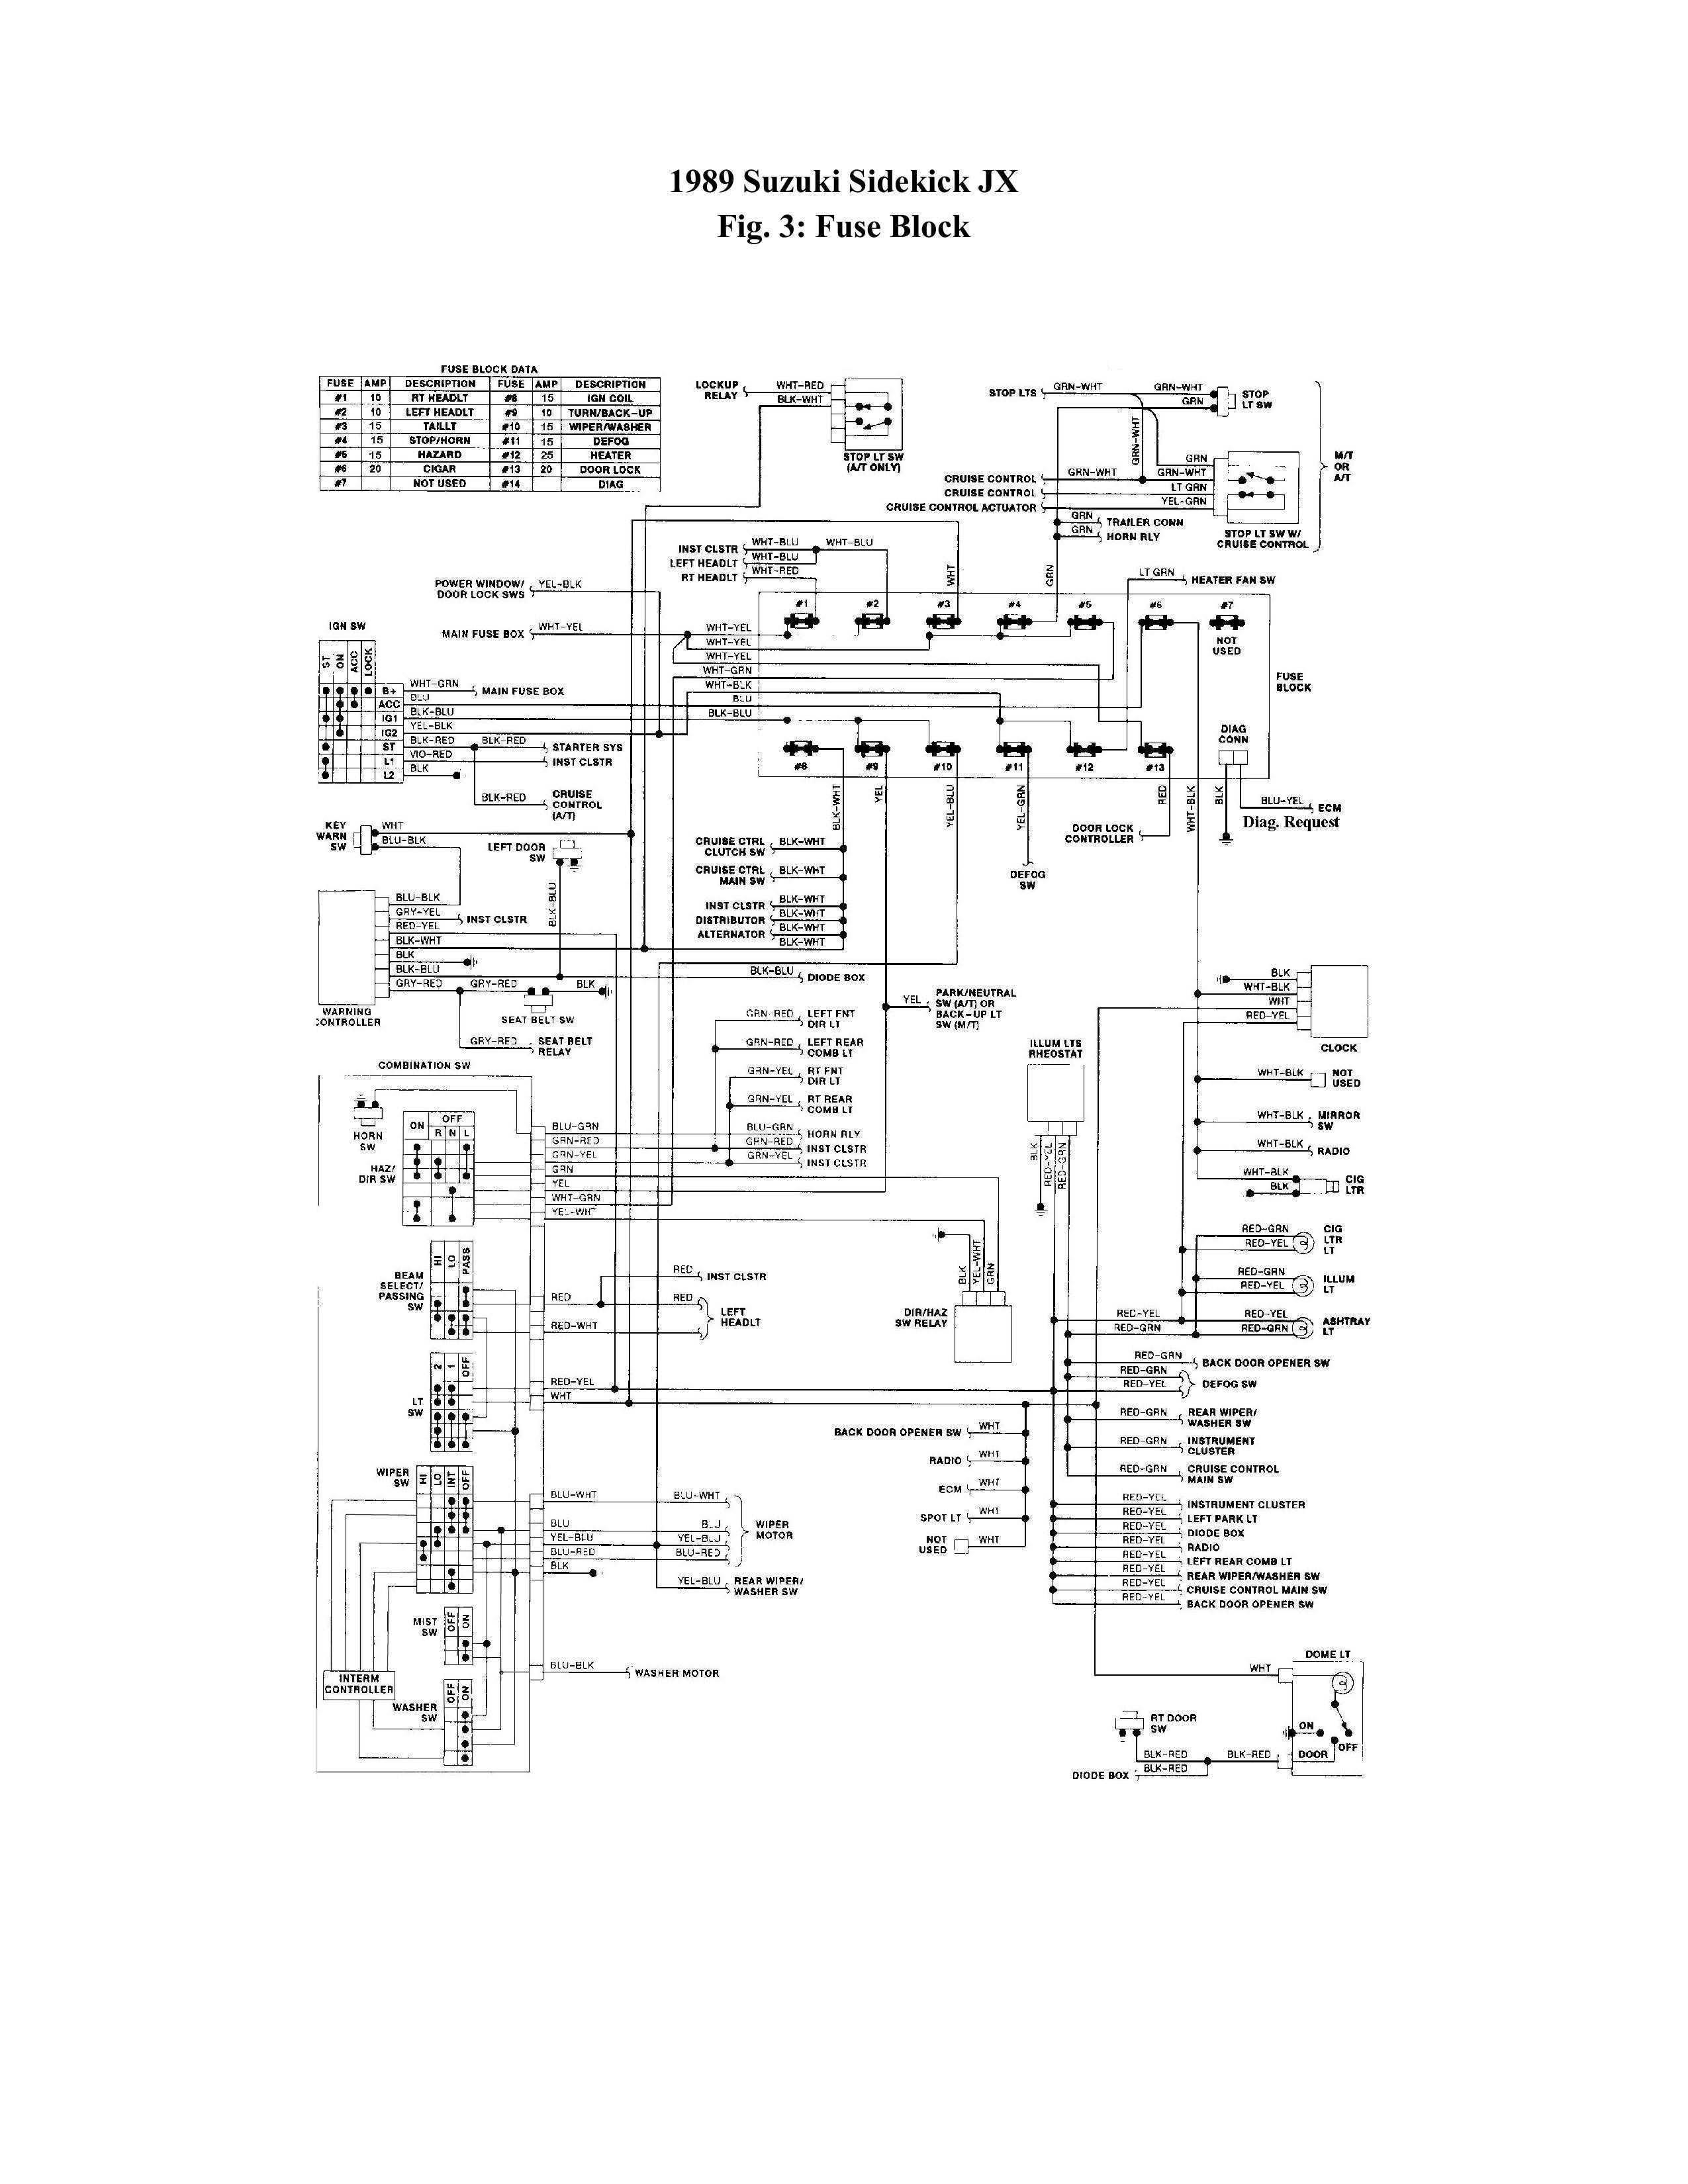 1989 suzuki sidekick wiring diagrams wd 1448  suzuki samurai wiring diagram likewise 1993 geo prizm  wiring diagram likewise 1993 geo prizm